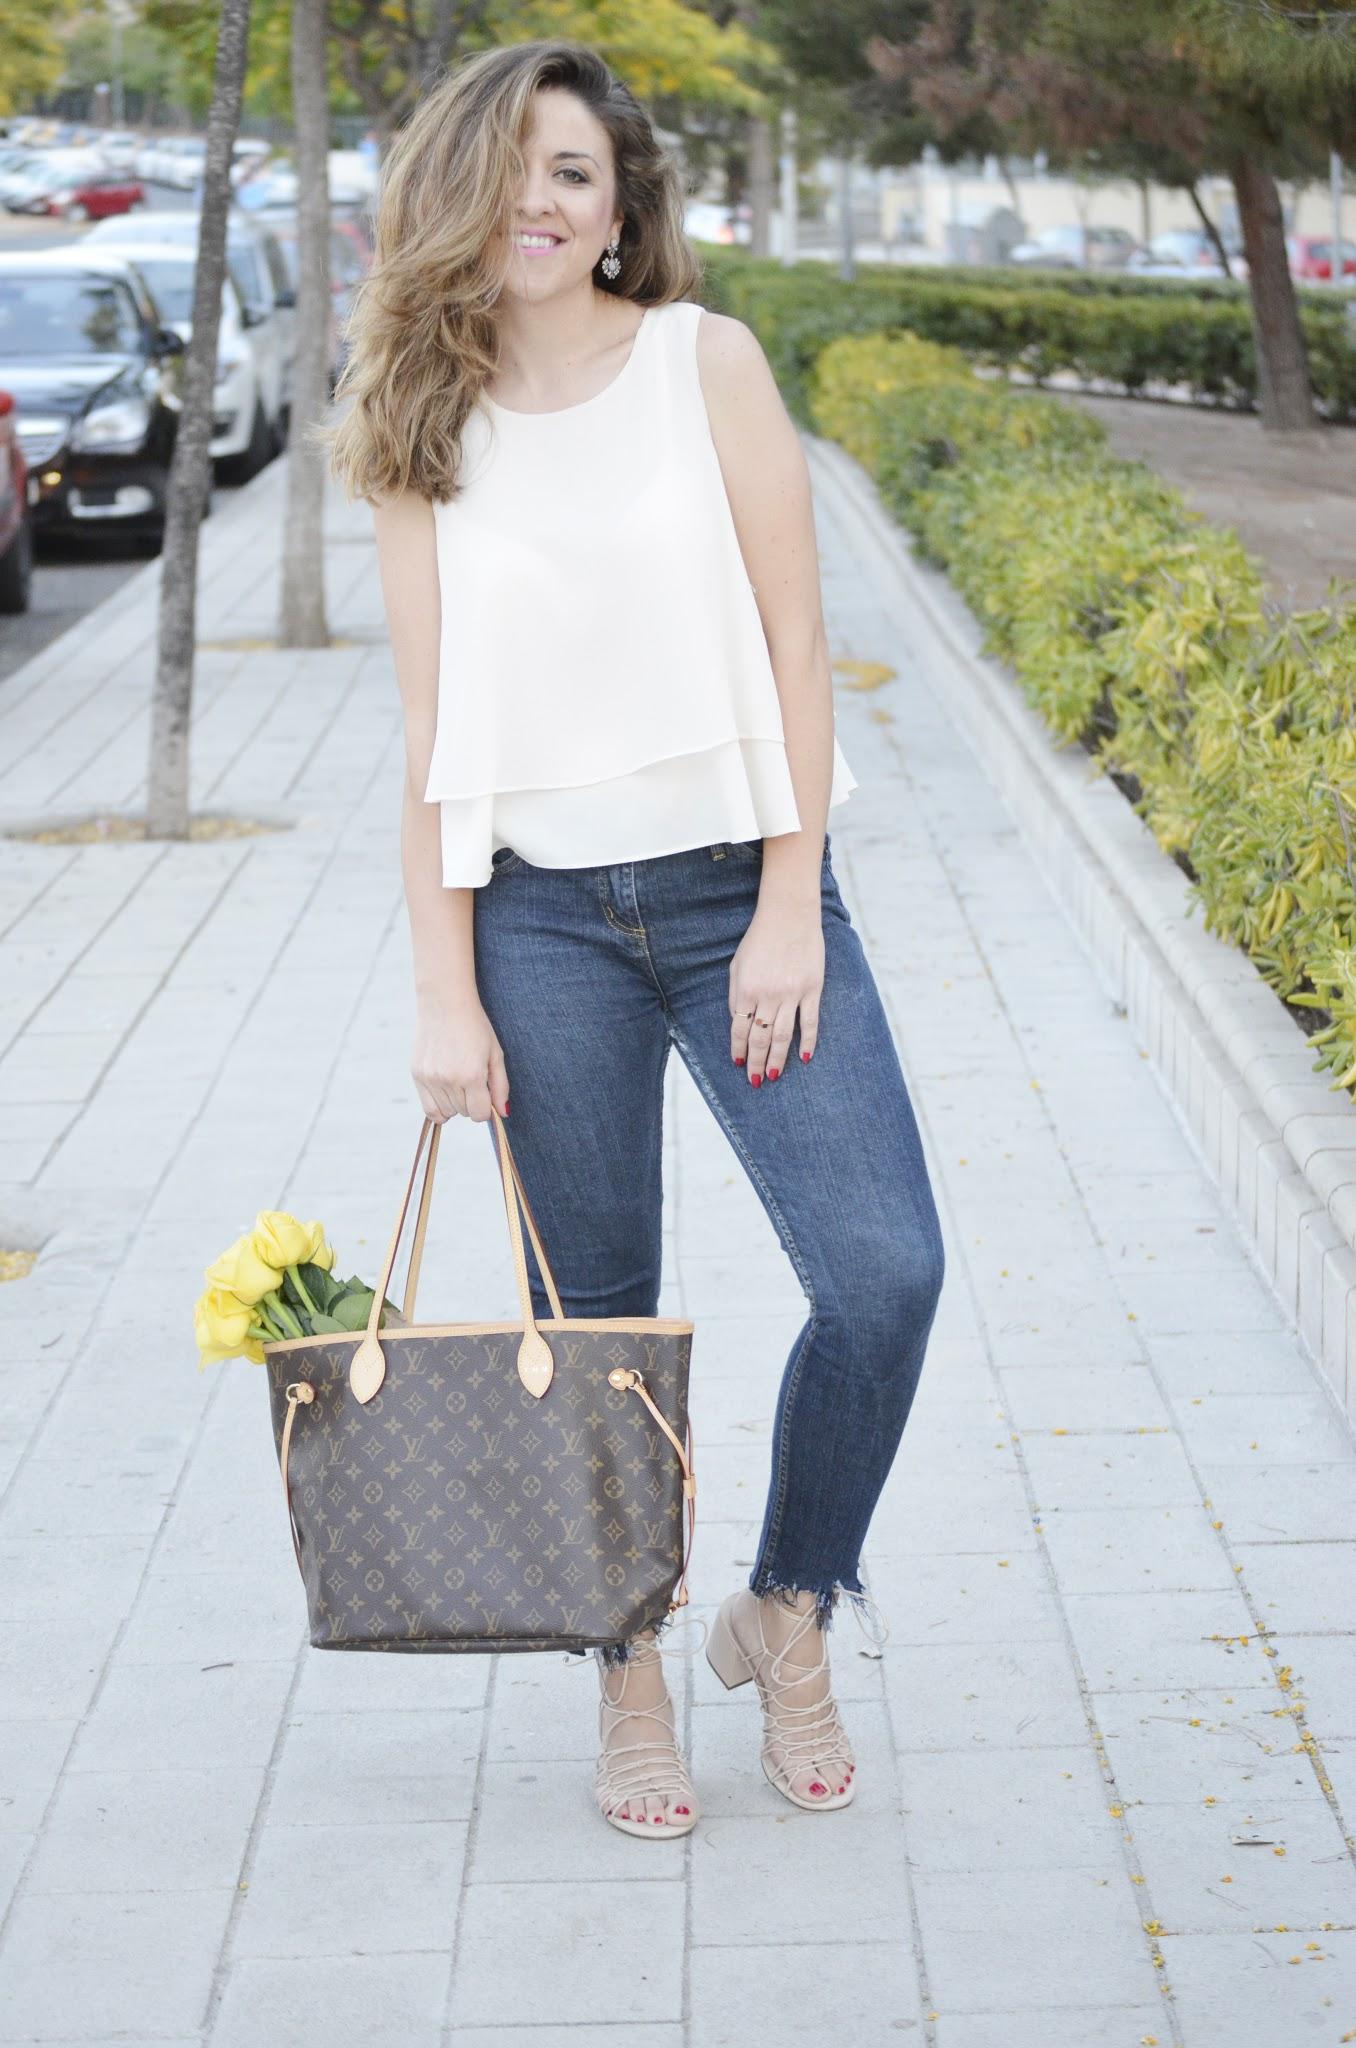 neverfull_louis_vuitton_tarasessence_fashion_blogger